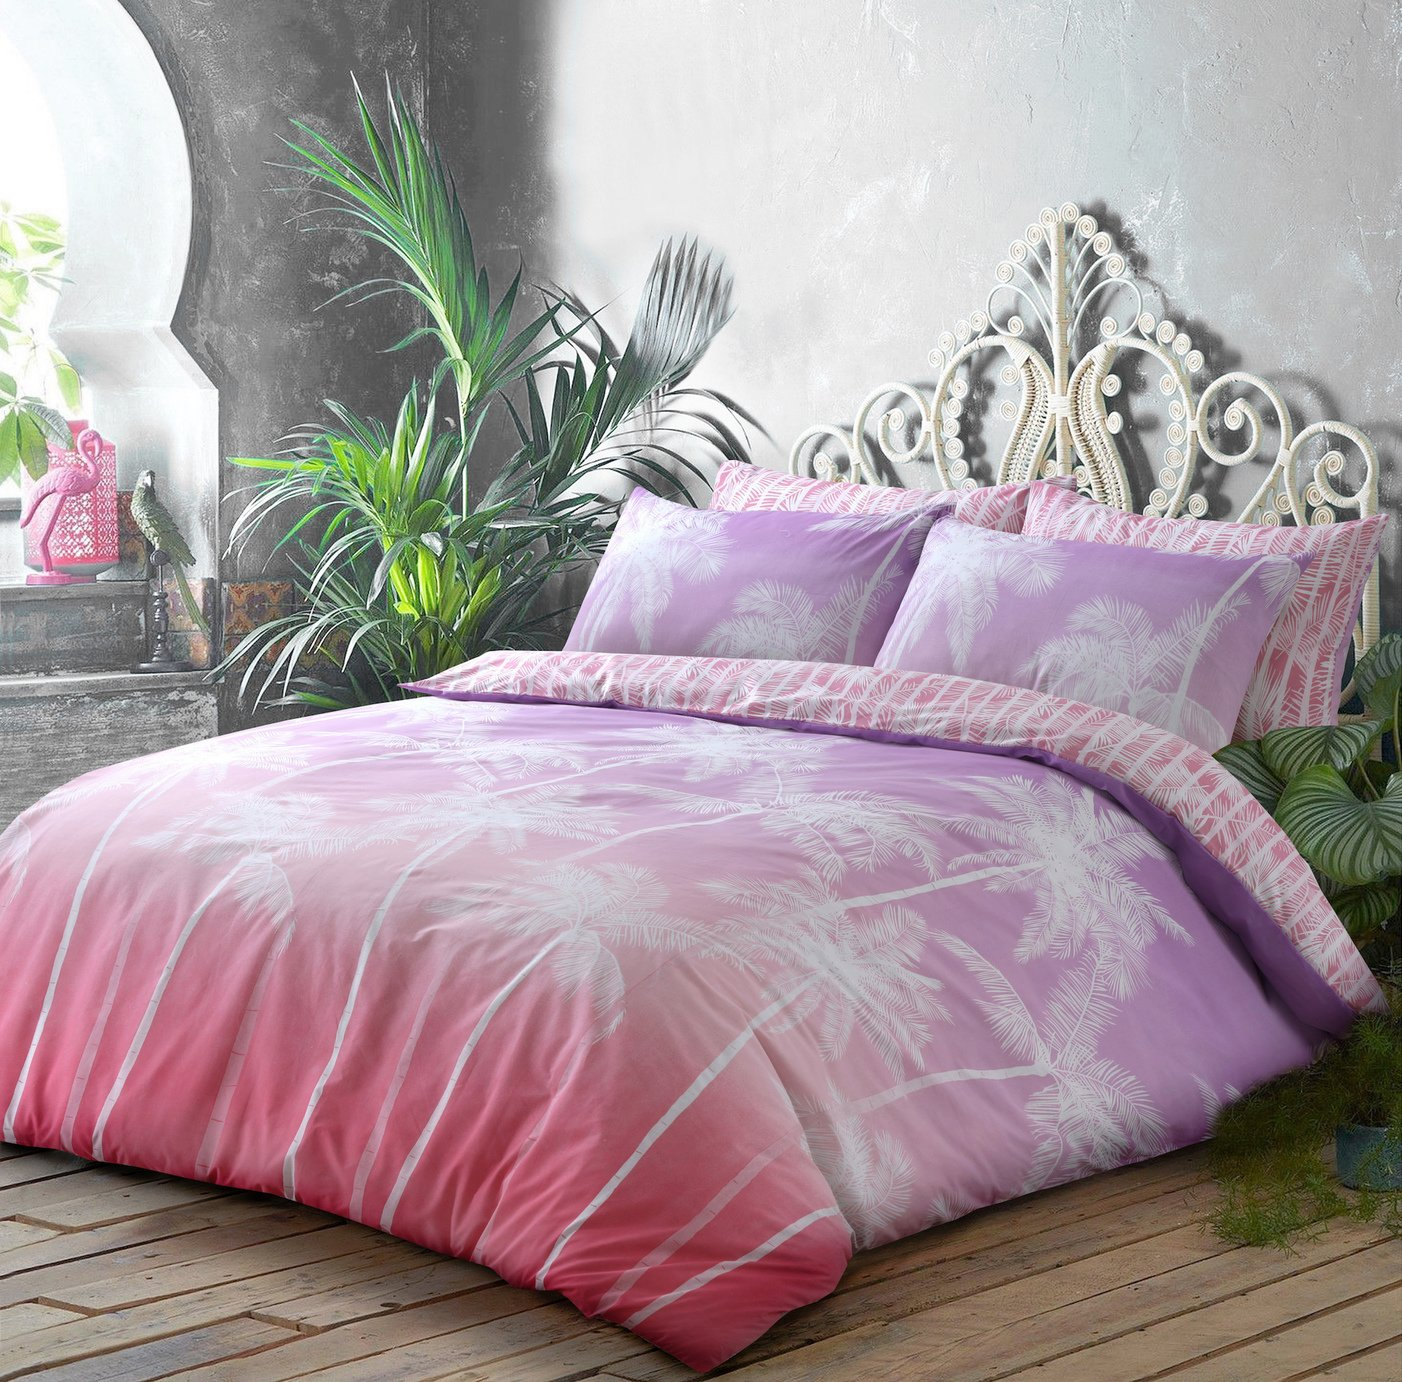 Argos Home Pink Ombre Palm Bedding Set - Superking